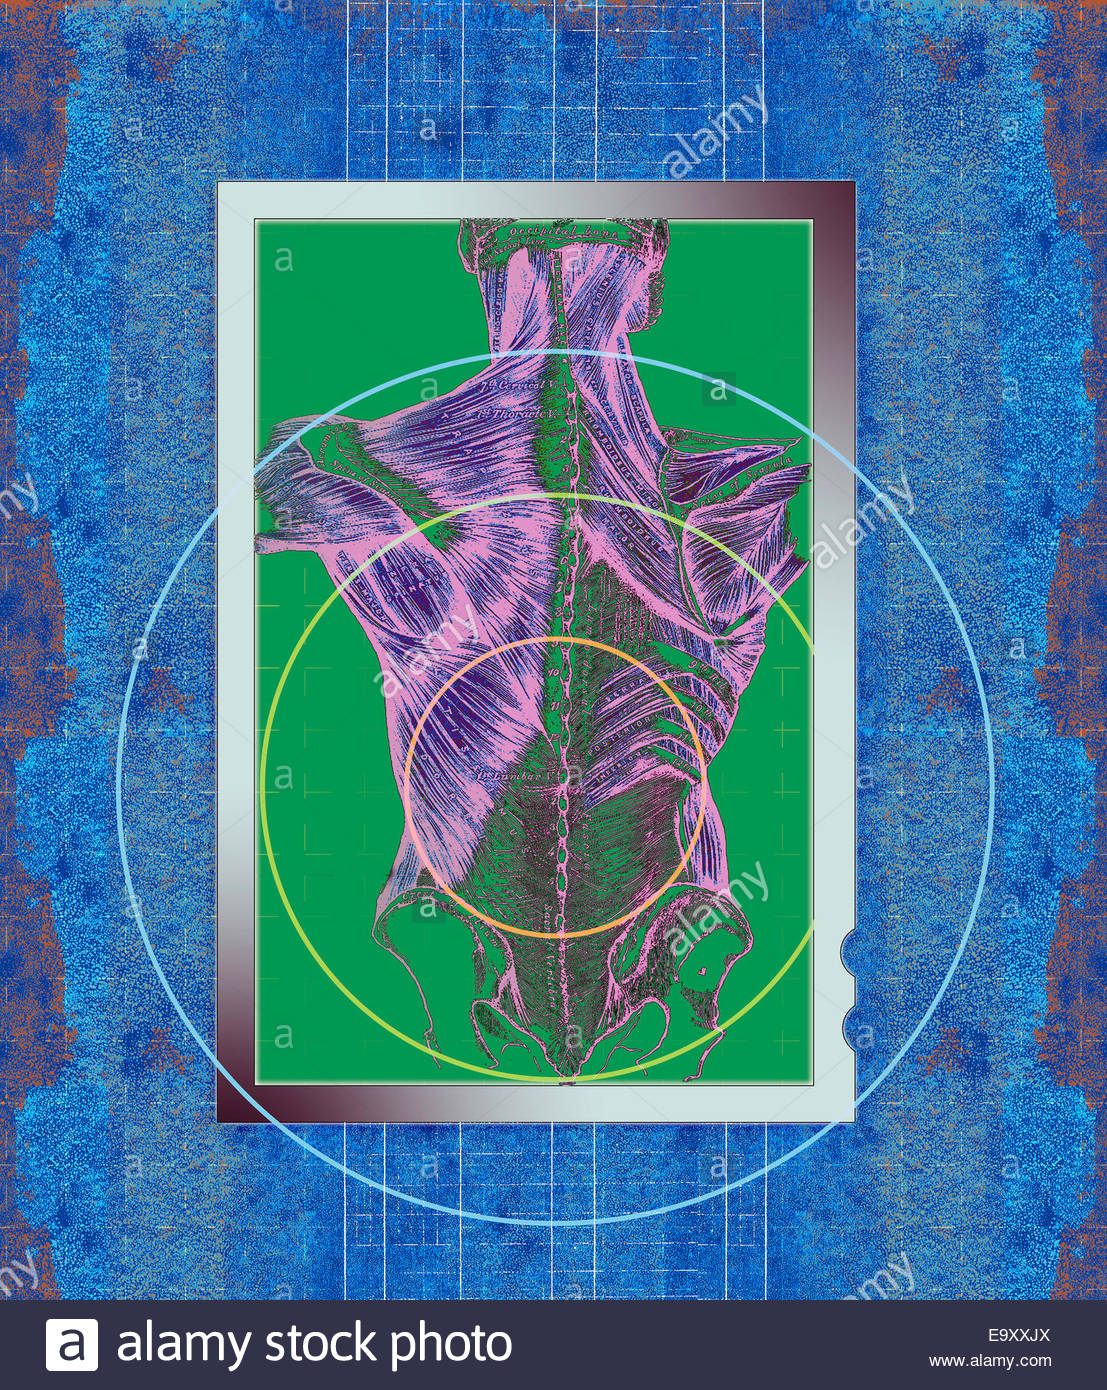 Target over anatomical diagram of human back - Stock Image